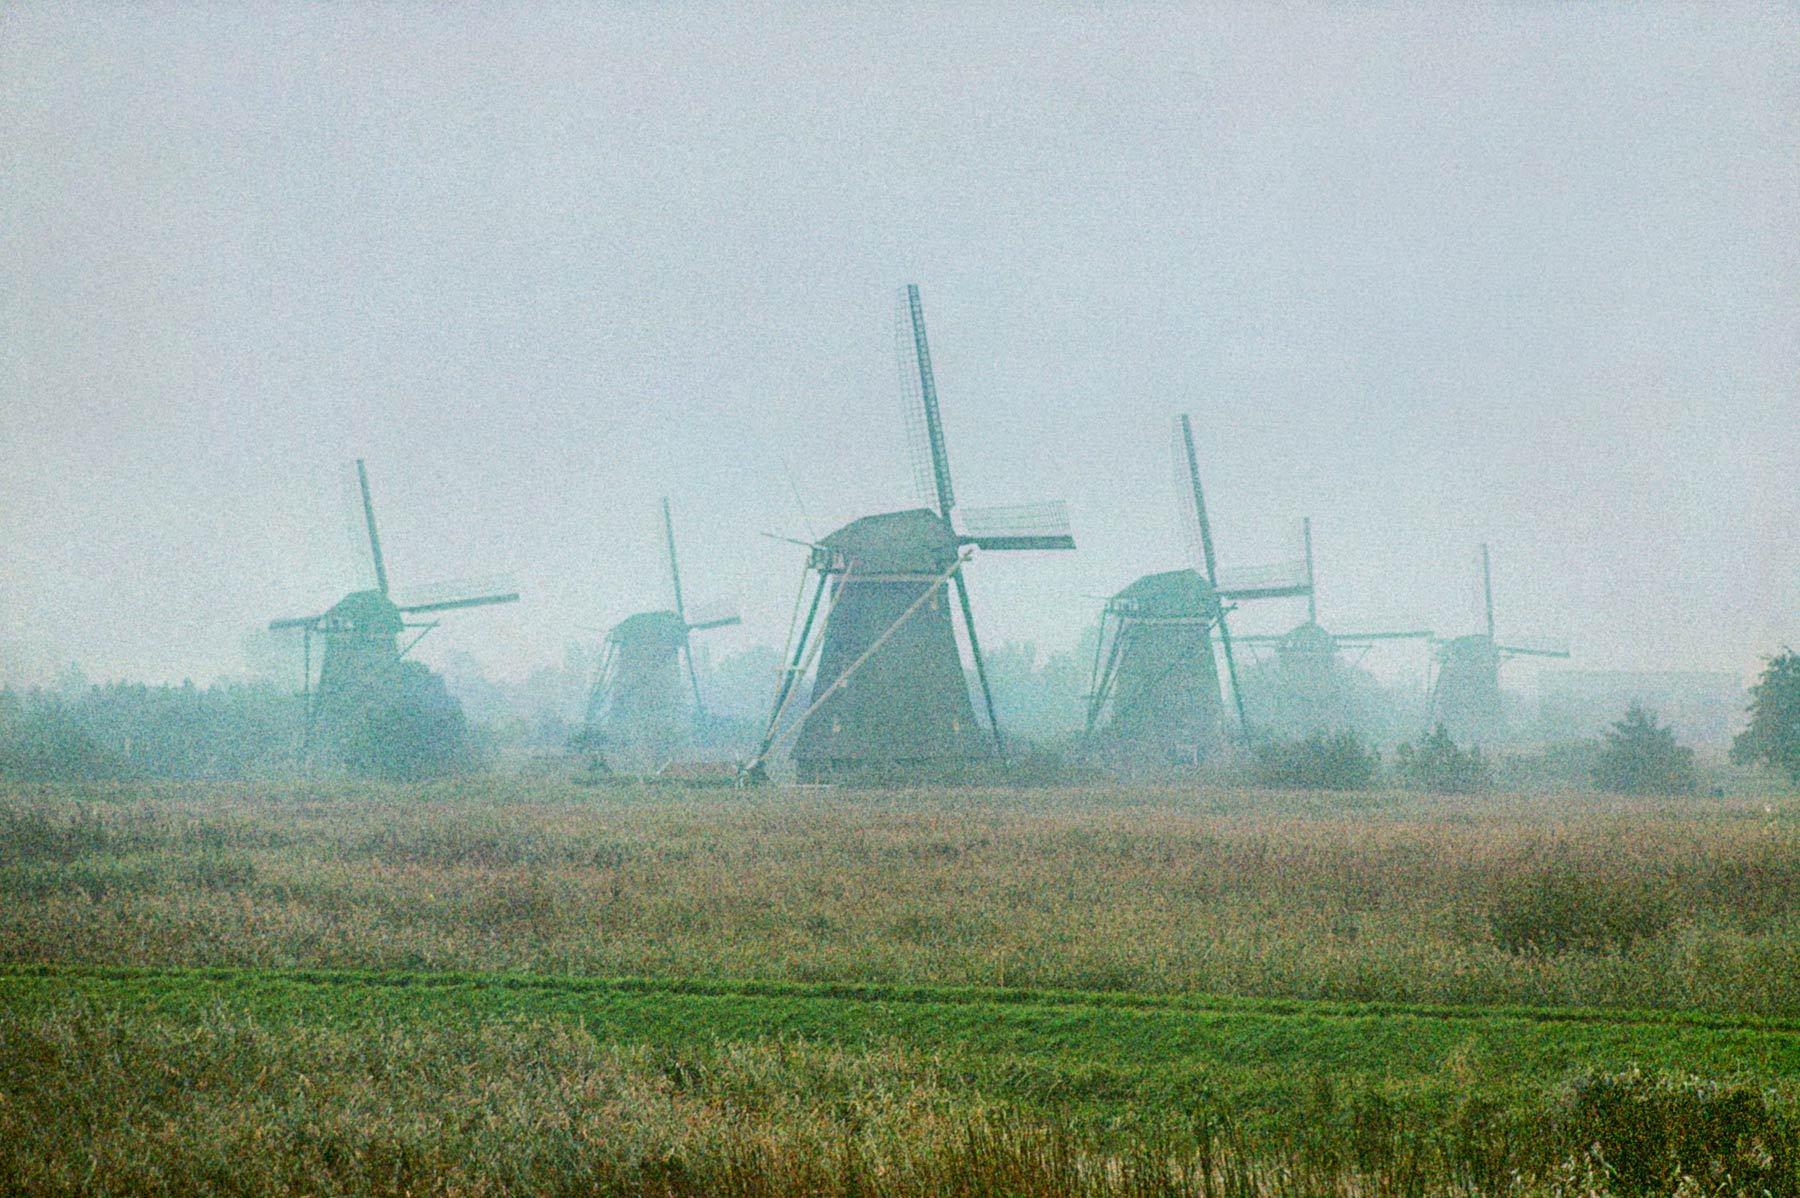 Windmills in Fog, the Netherlands